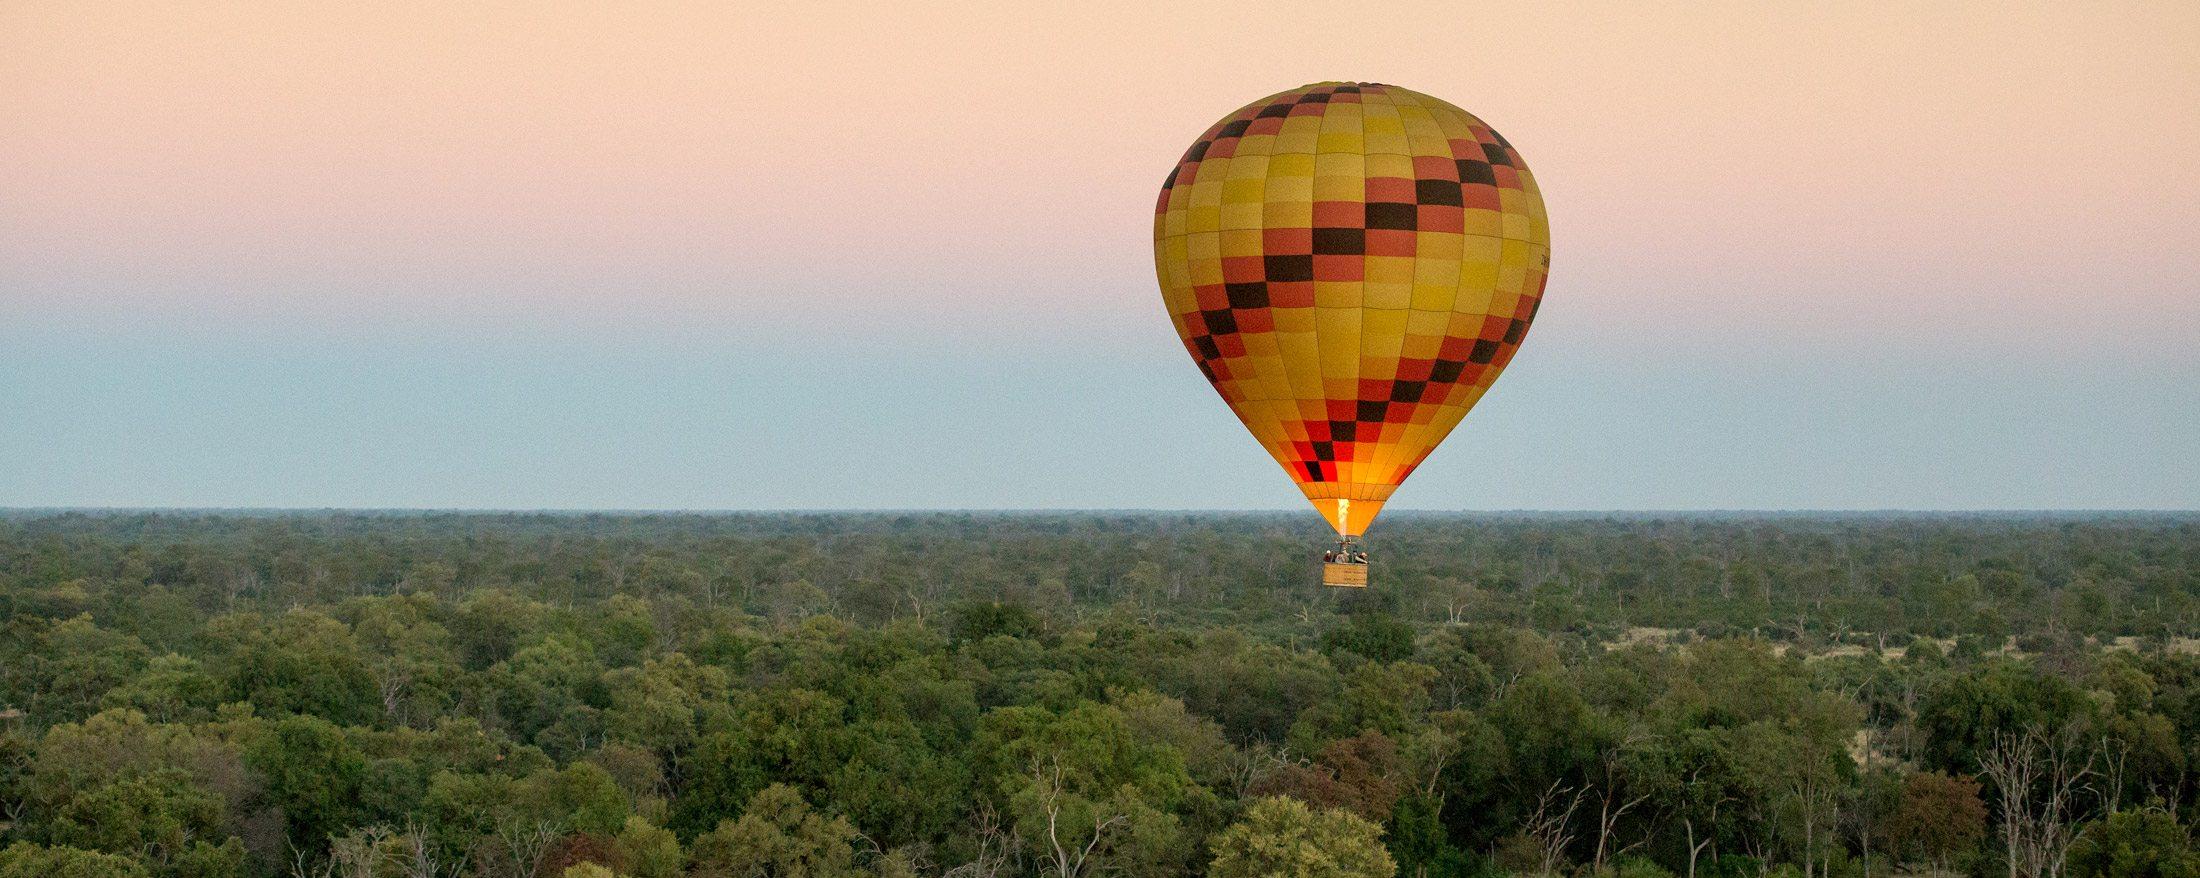 An Okavango Delta balloon safari is the experience of a lifetime.